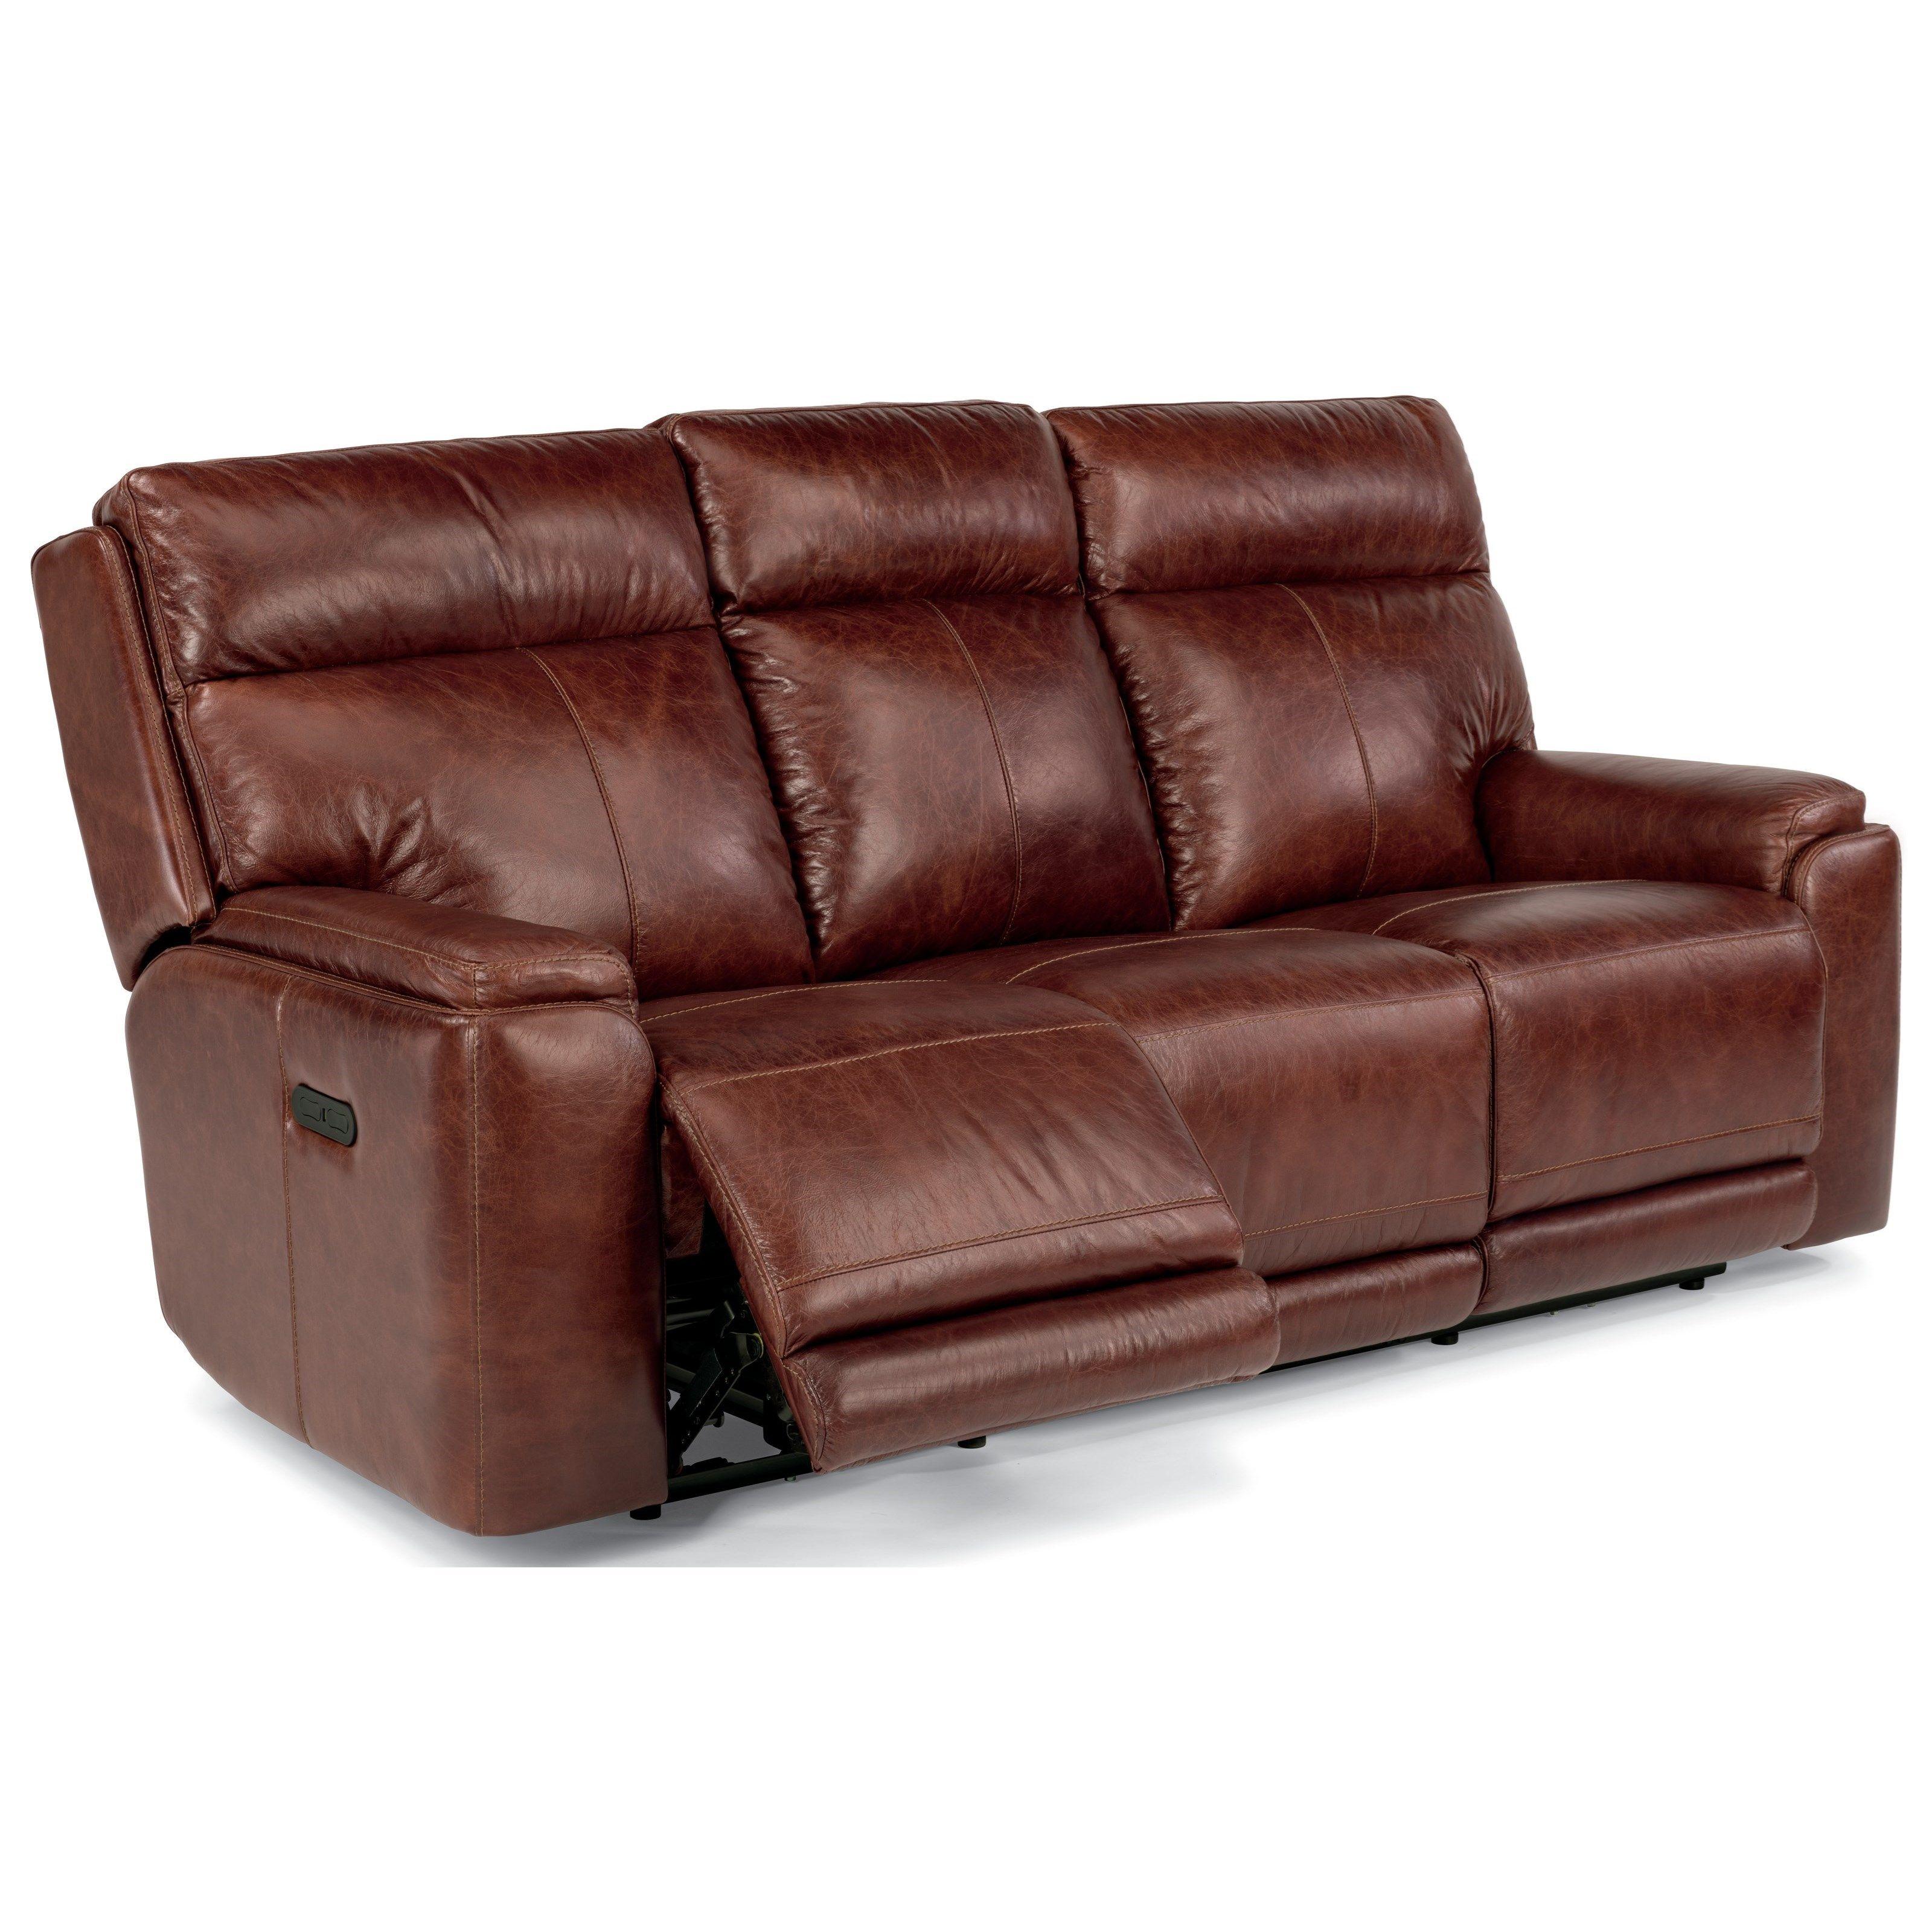 Latitudes Sienna Power Reclining Sofa With Power Headrest By